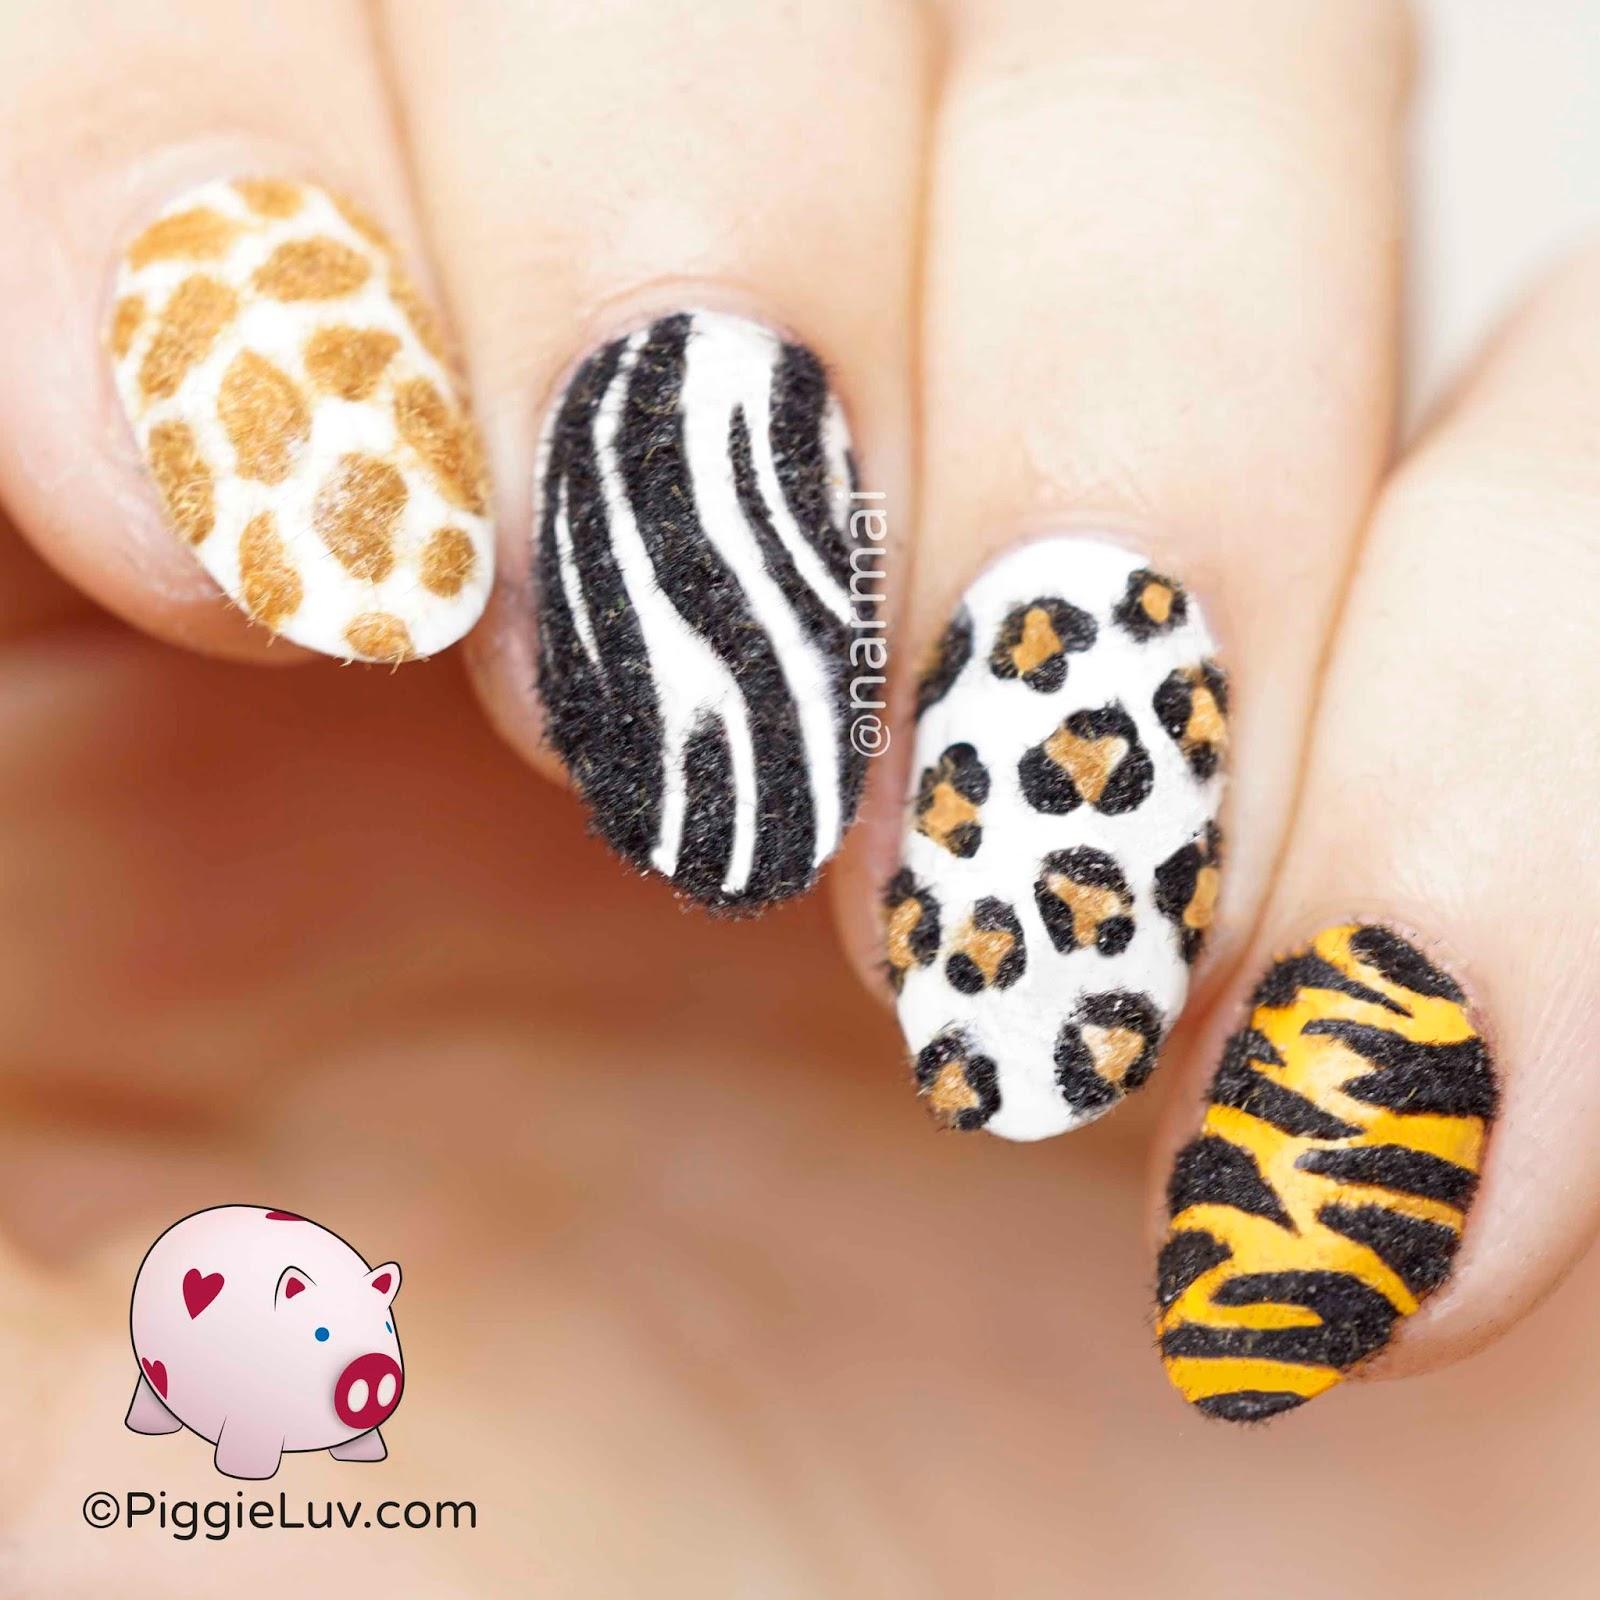 PiggieLuv: Fuzzy animal print nail art